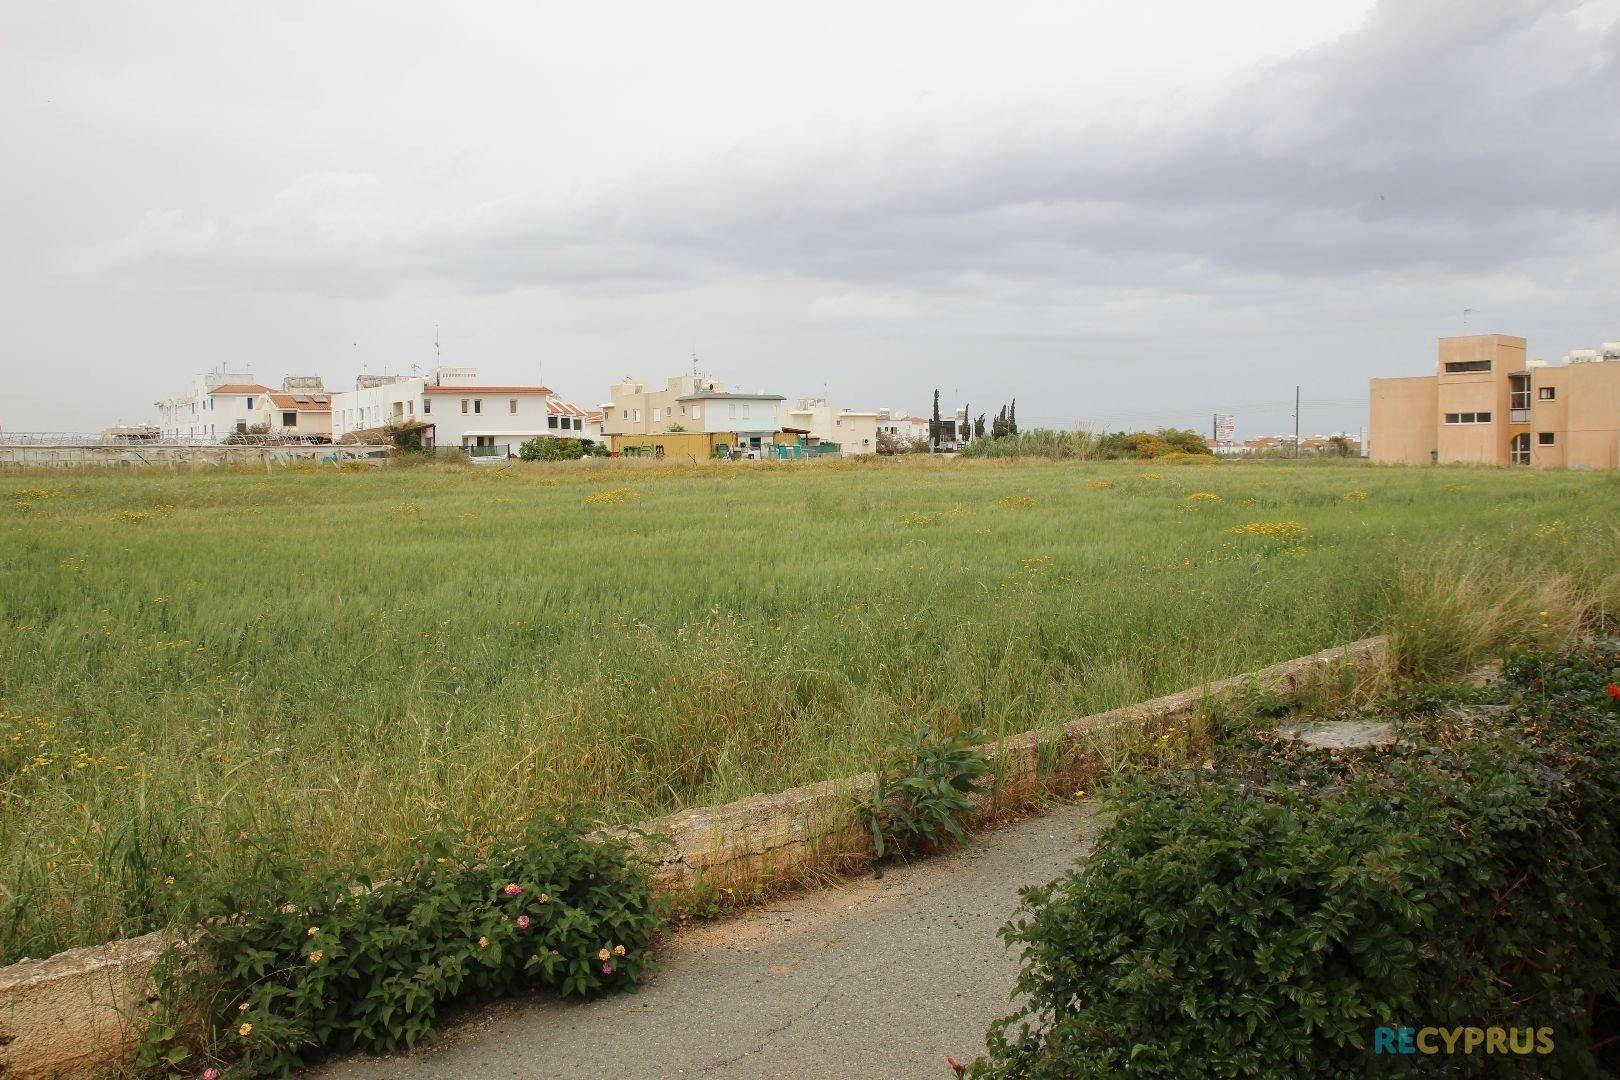 Apartment for sale Kapparis Famagusta Cyprus 9 3559